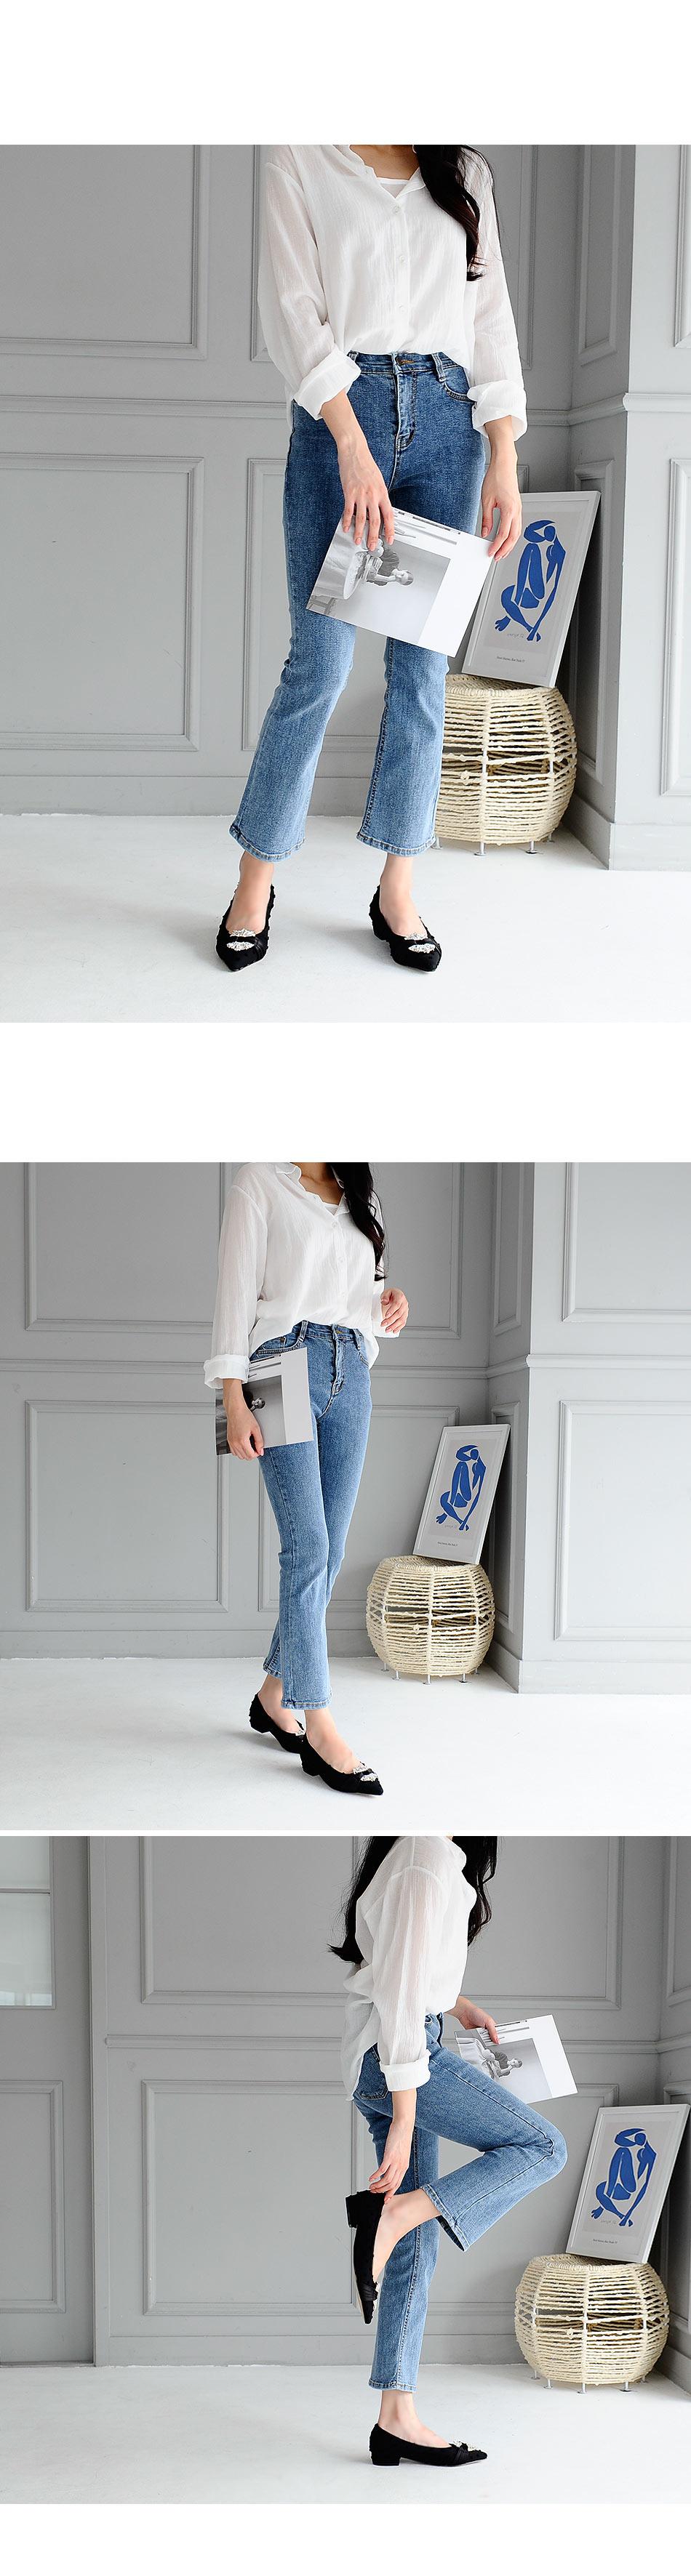 Ravlon flat & middle heel 2,5,6cm